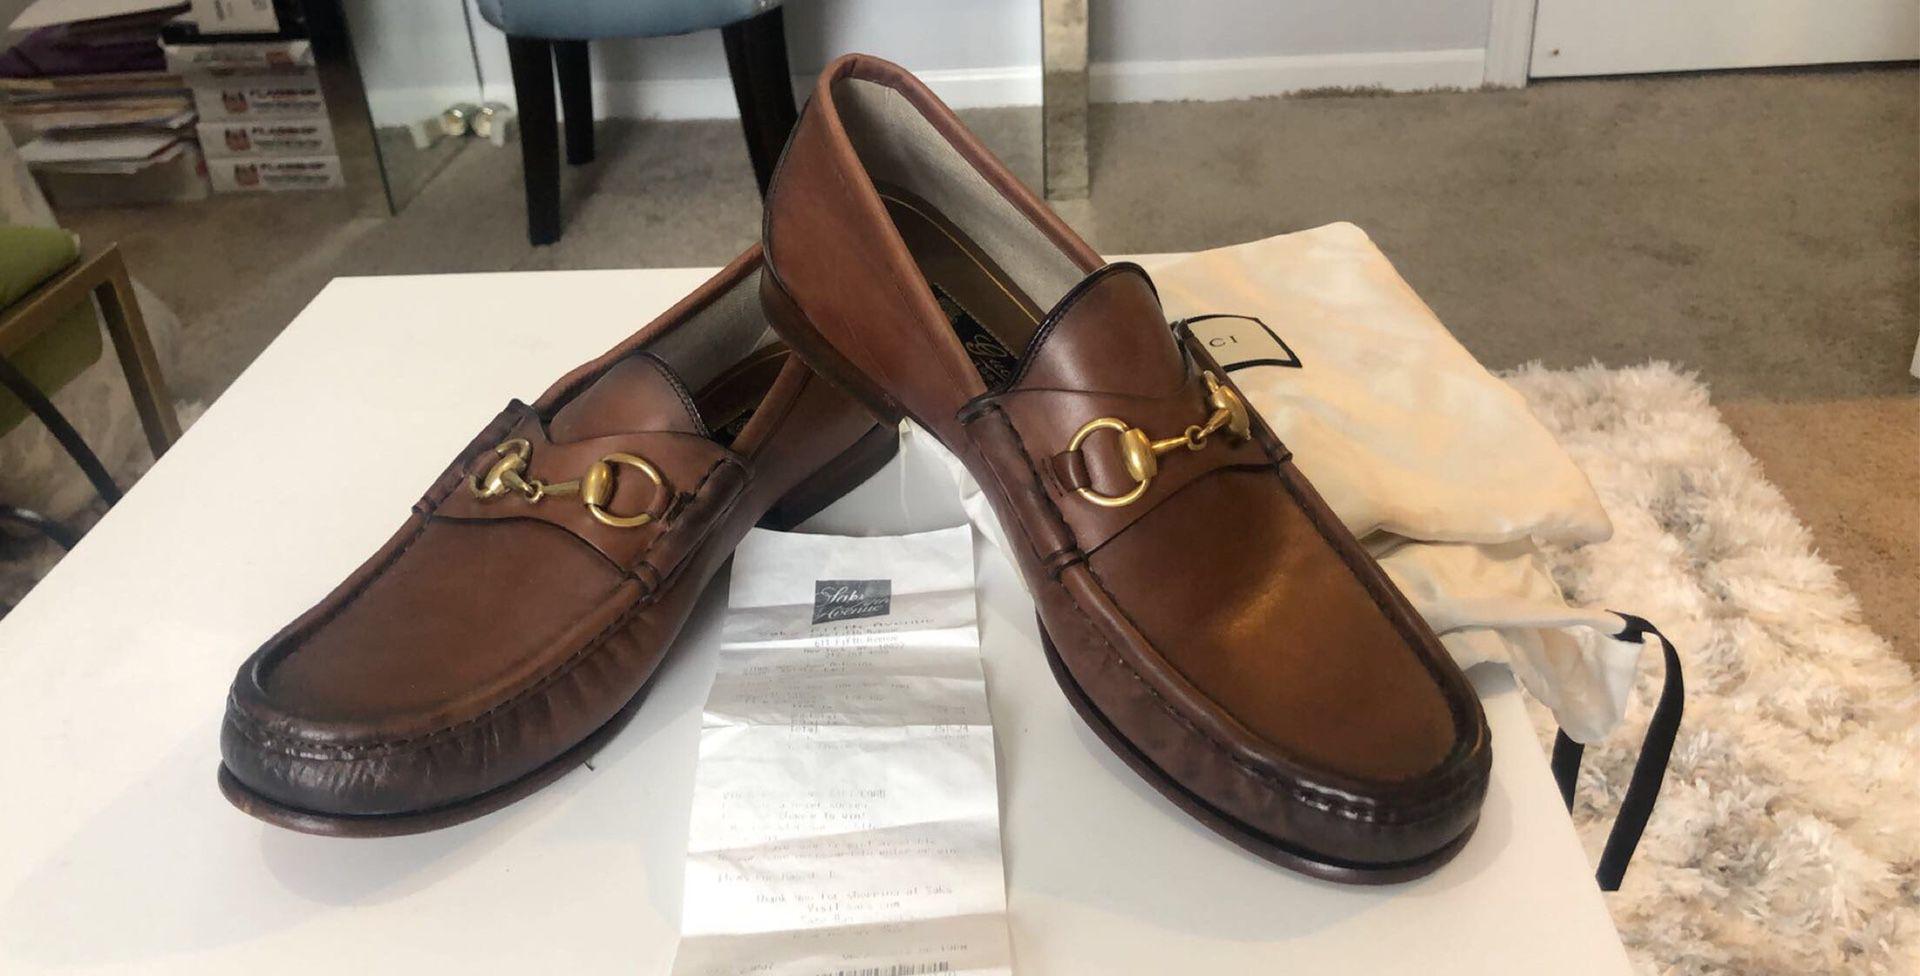 GUCCI 1953 Horsebit Leather Loafer. Men. Size 9